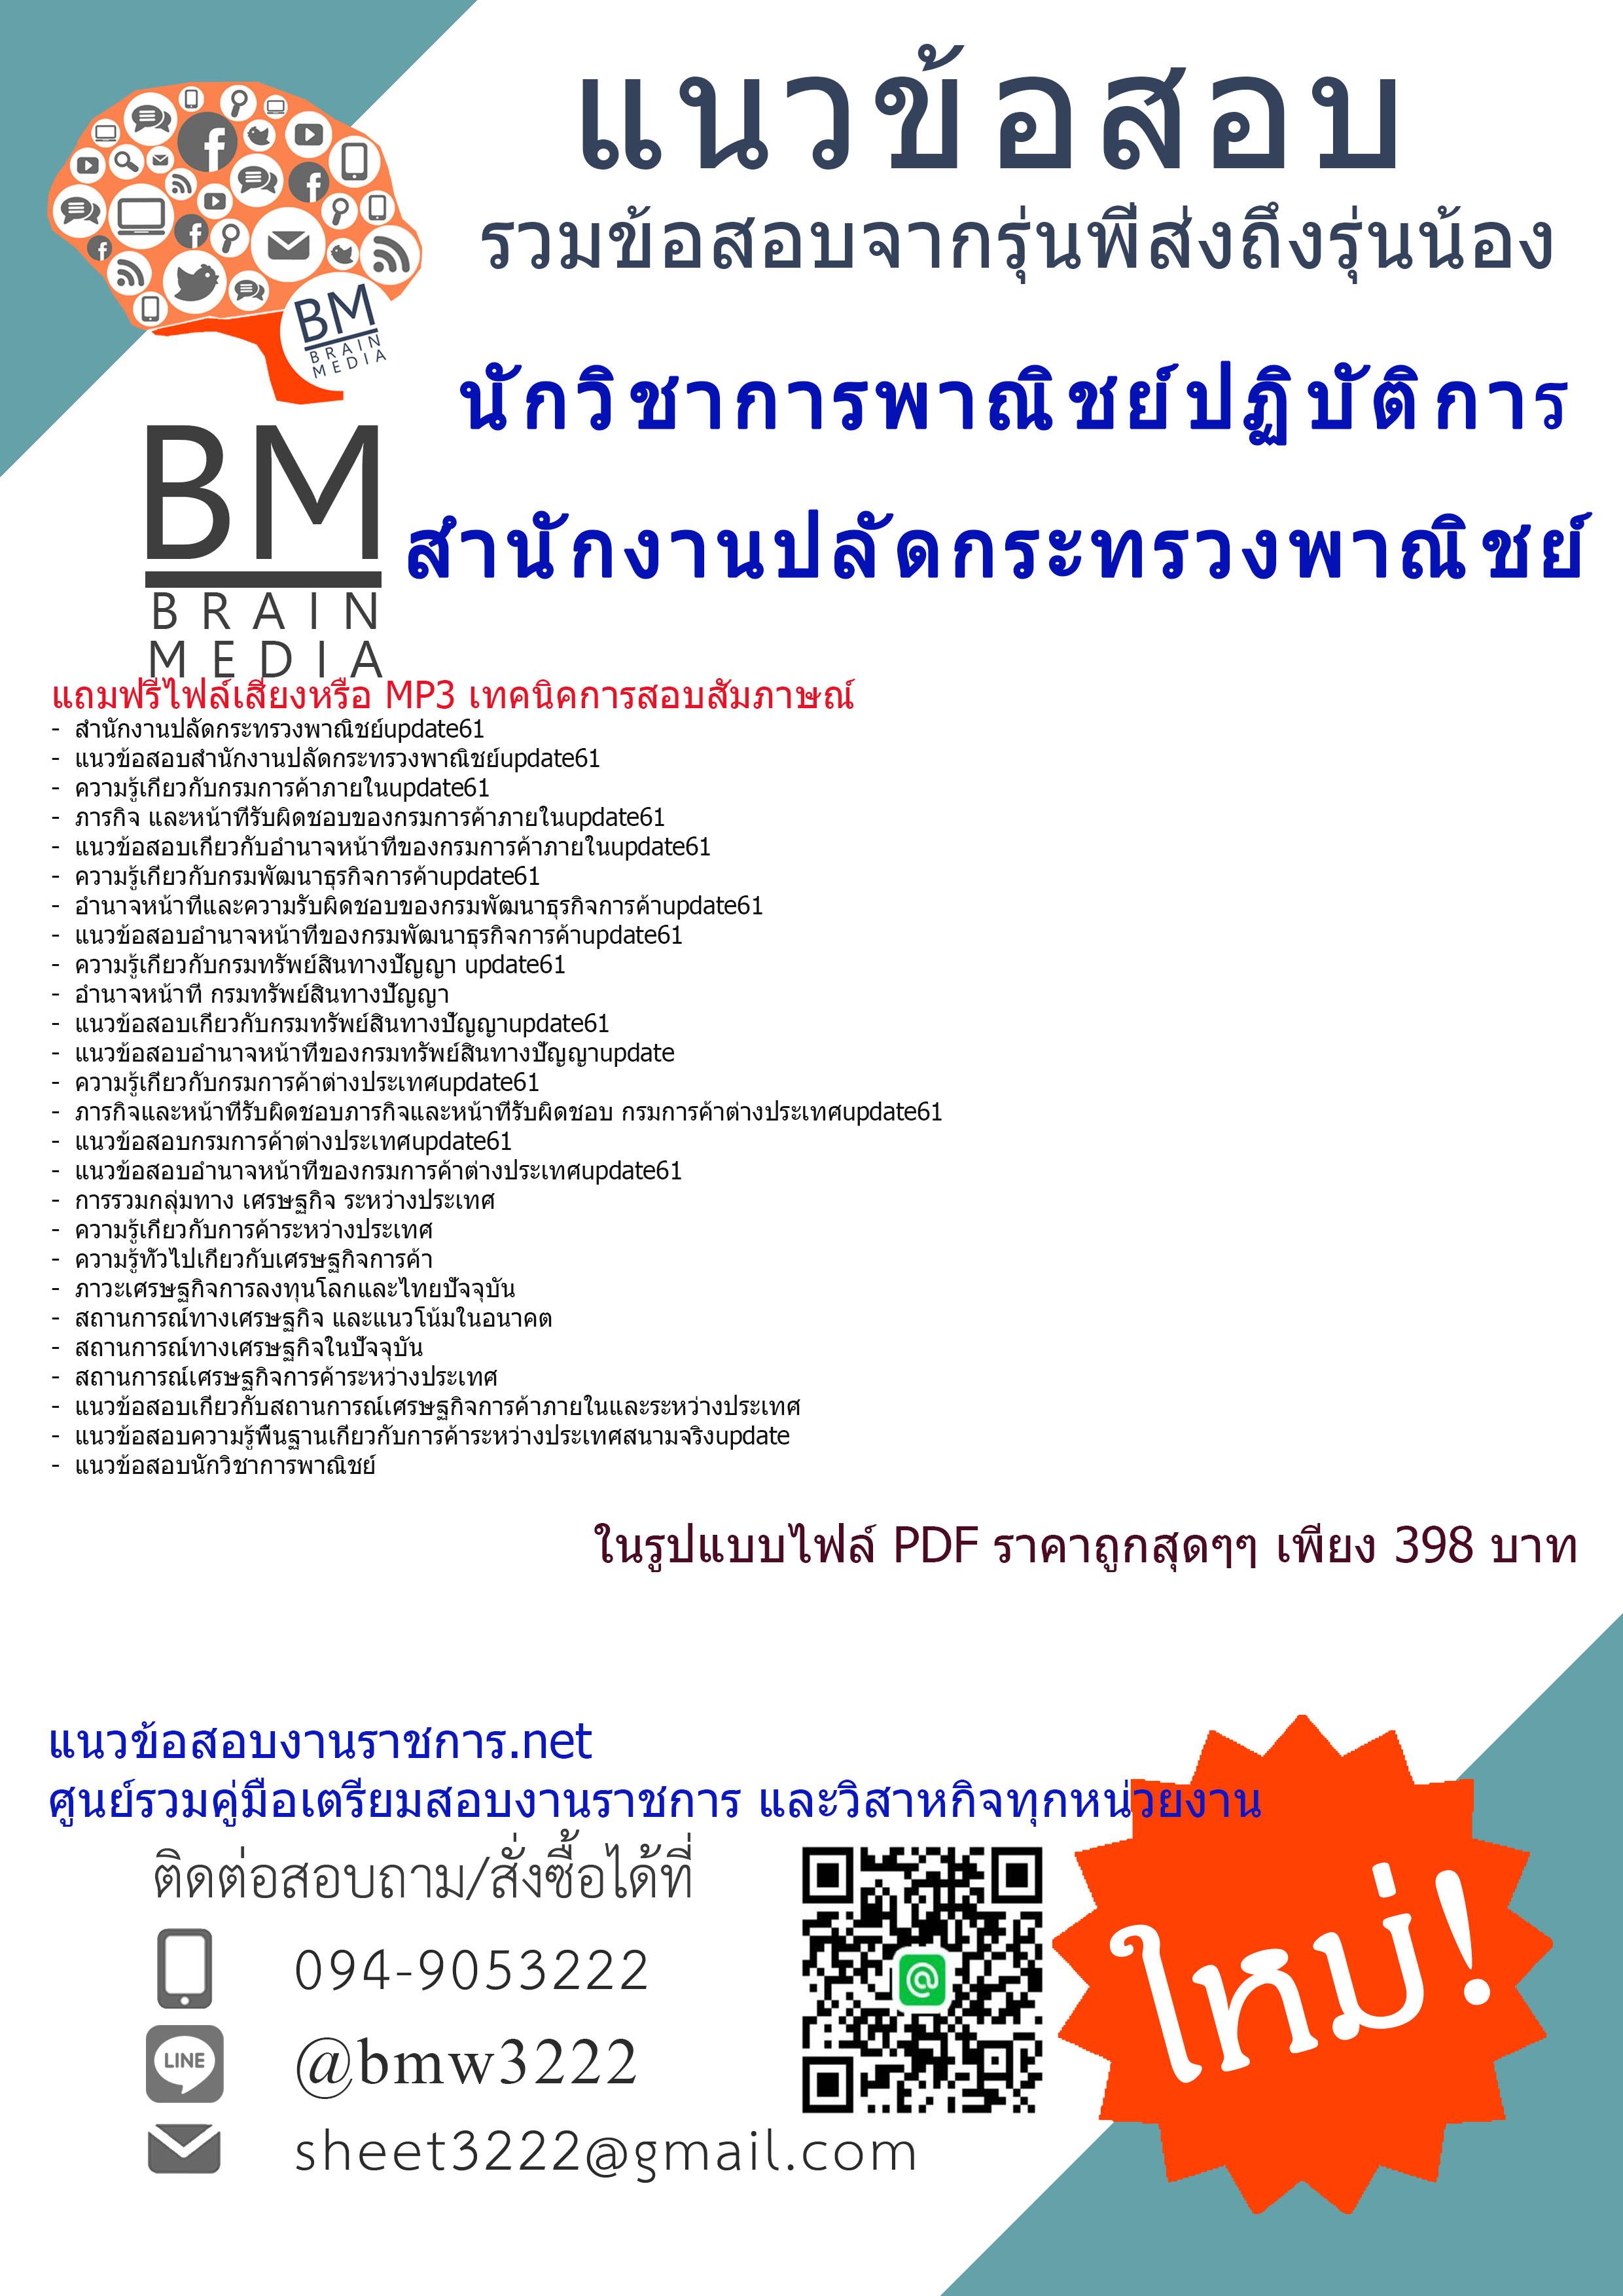 (((updateที่สุด)))แนวข้อสอบนักวิชาการพาณิชย์ปฏิบัติการสำนักงานปลัดกระทรวงพาณิชย์